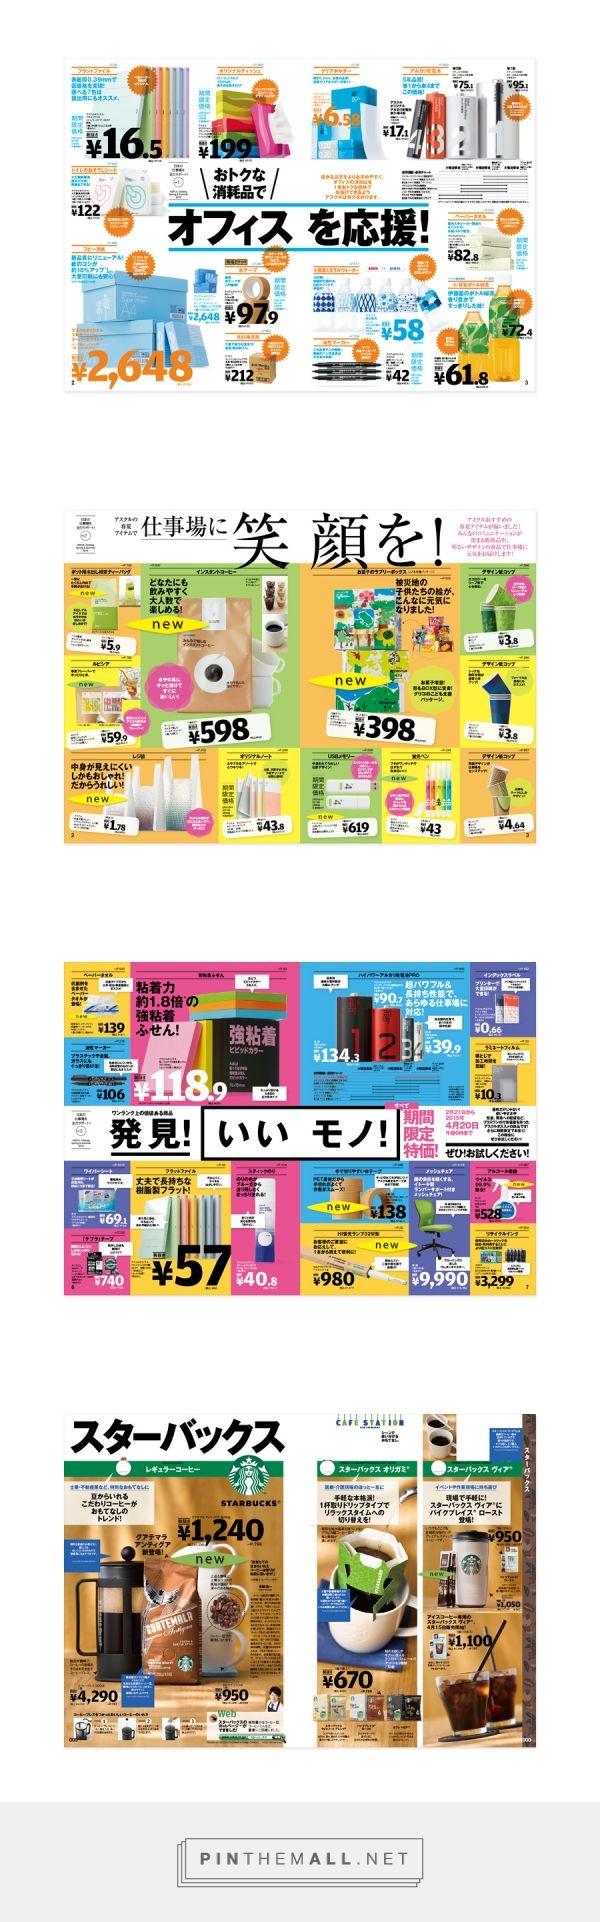 Askul 23-1   Okamoto Issen Graphic Design Co.,Ltd....